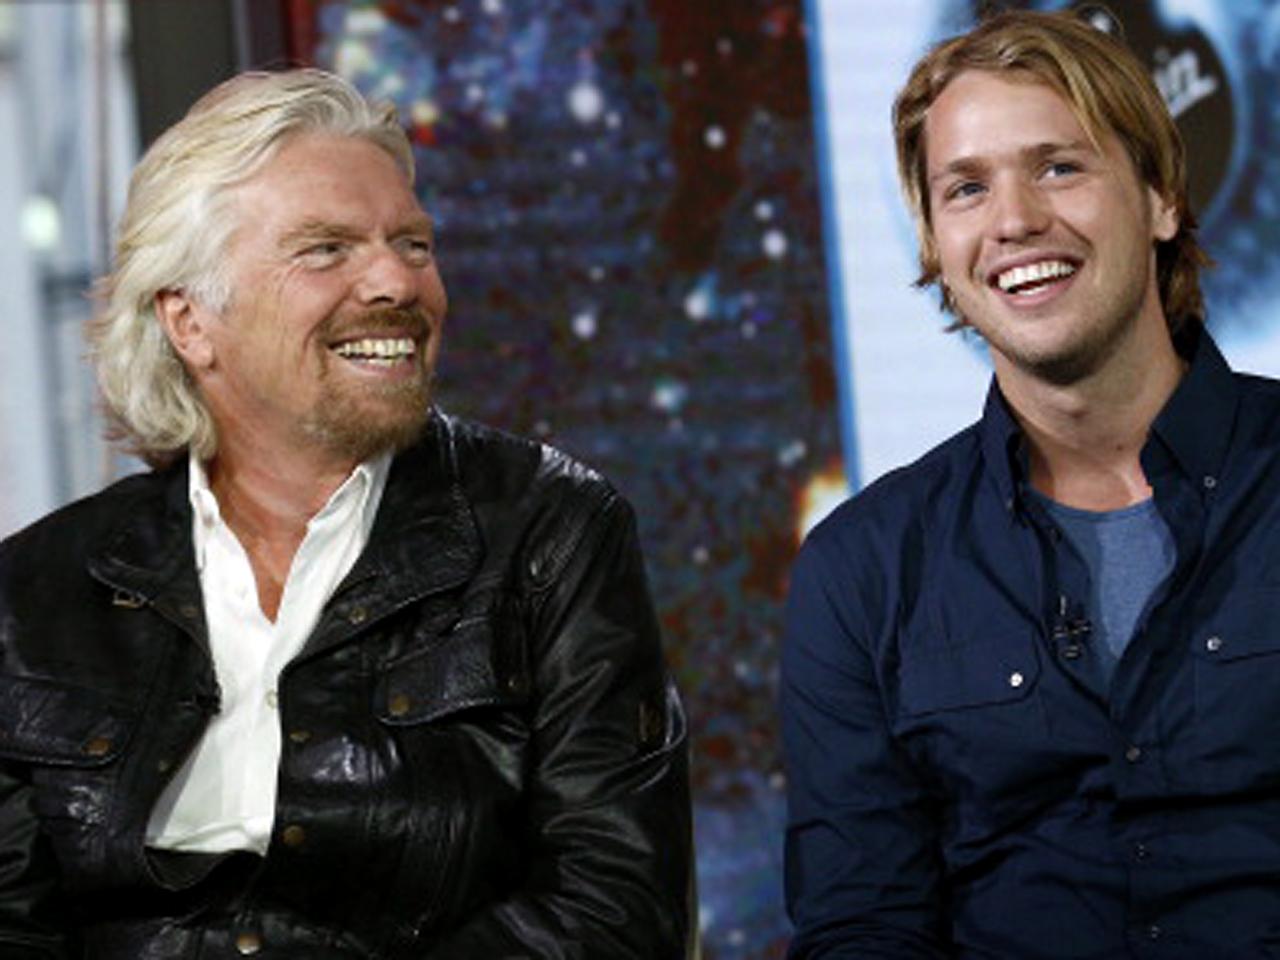 Image: Bransons